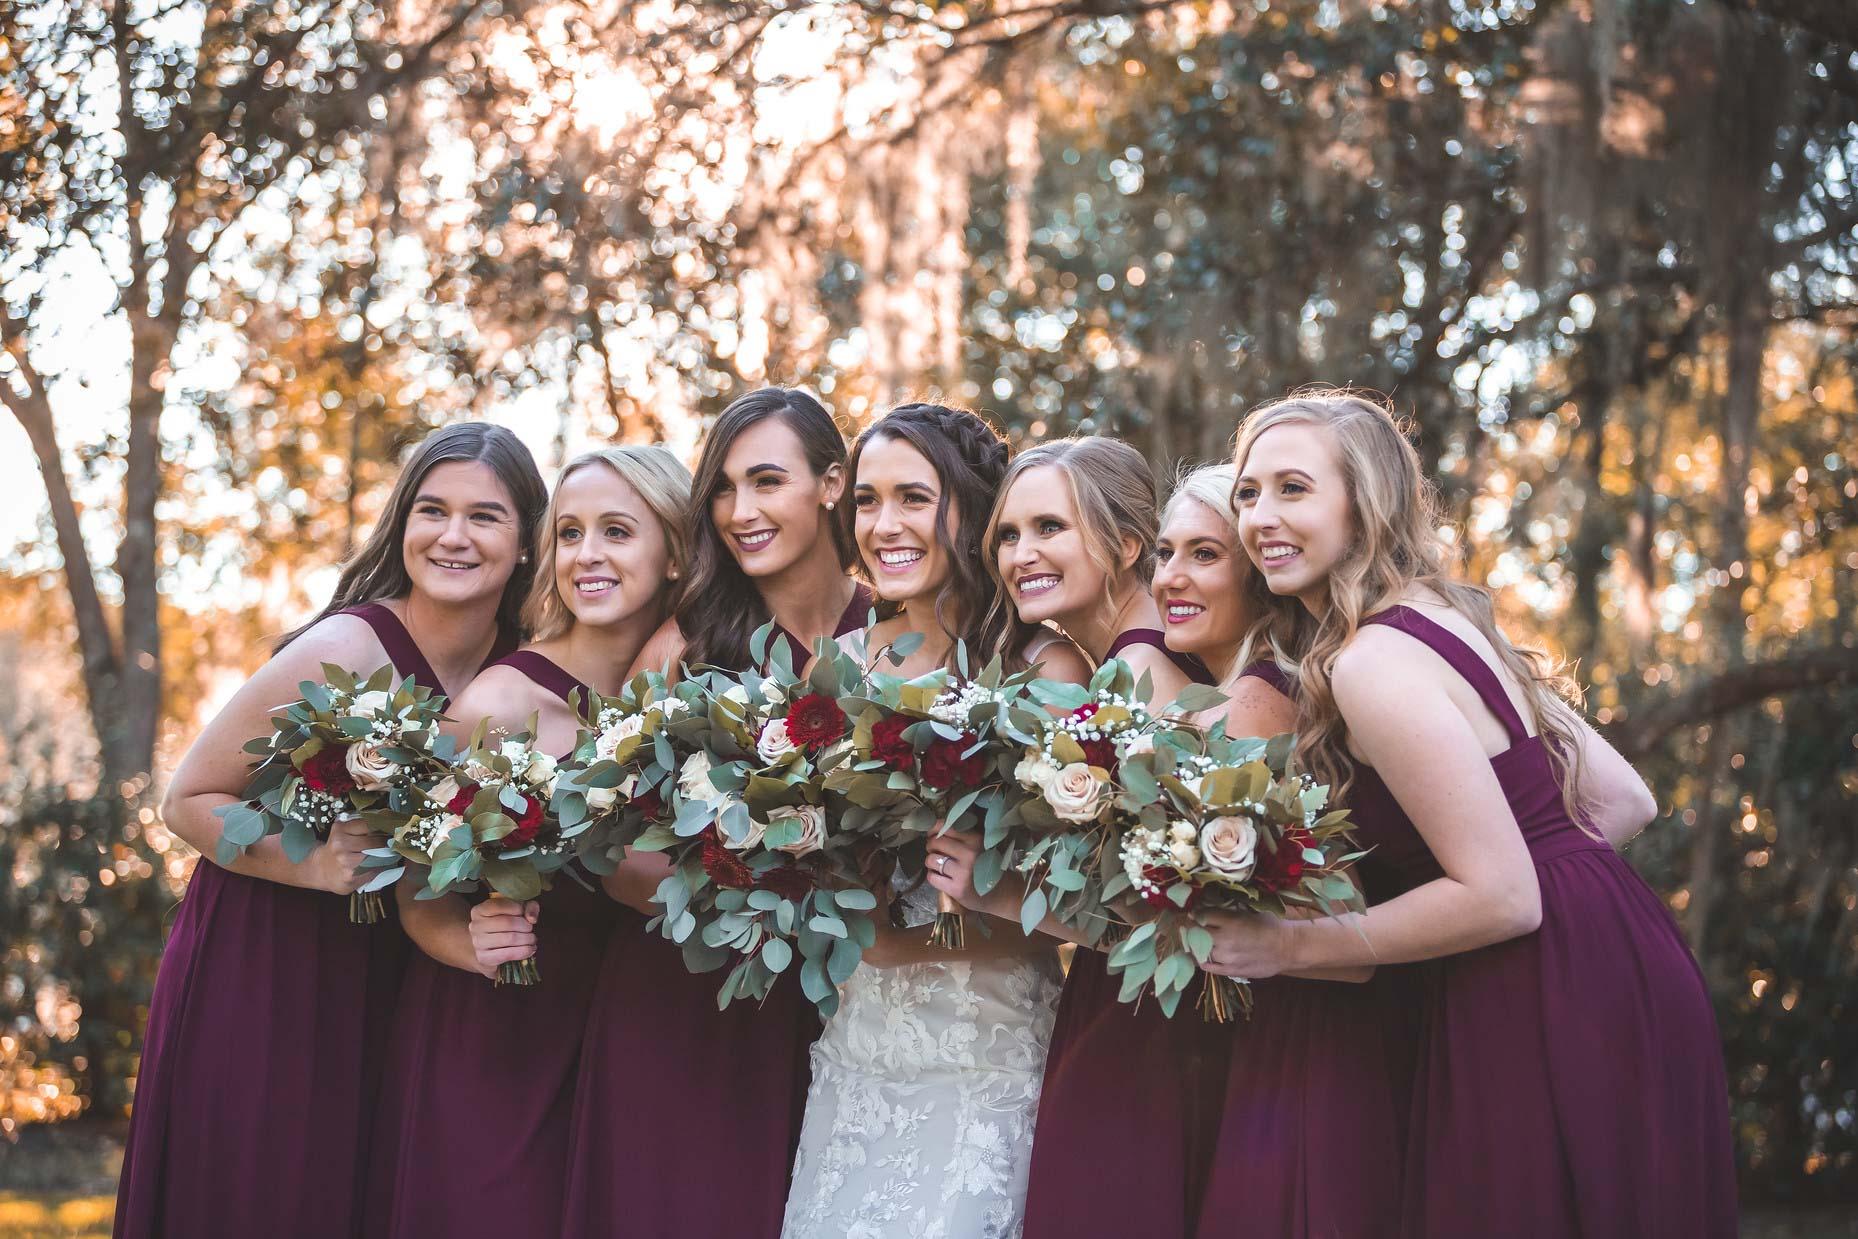 adam-szarmack-bowing-oaks-wedding-photographer-jacksonville-89.jpg